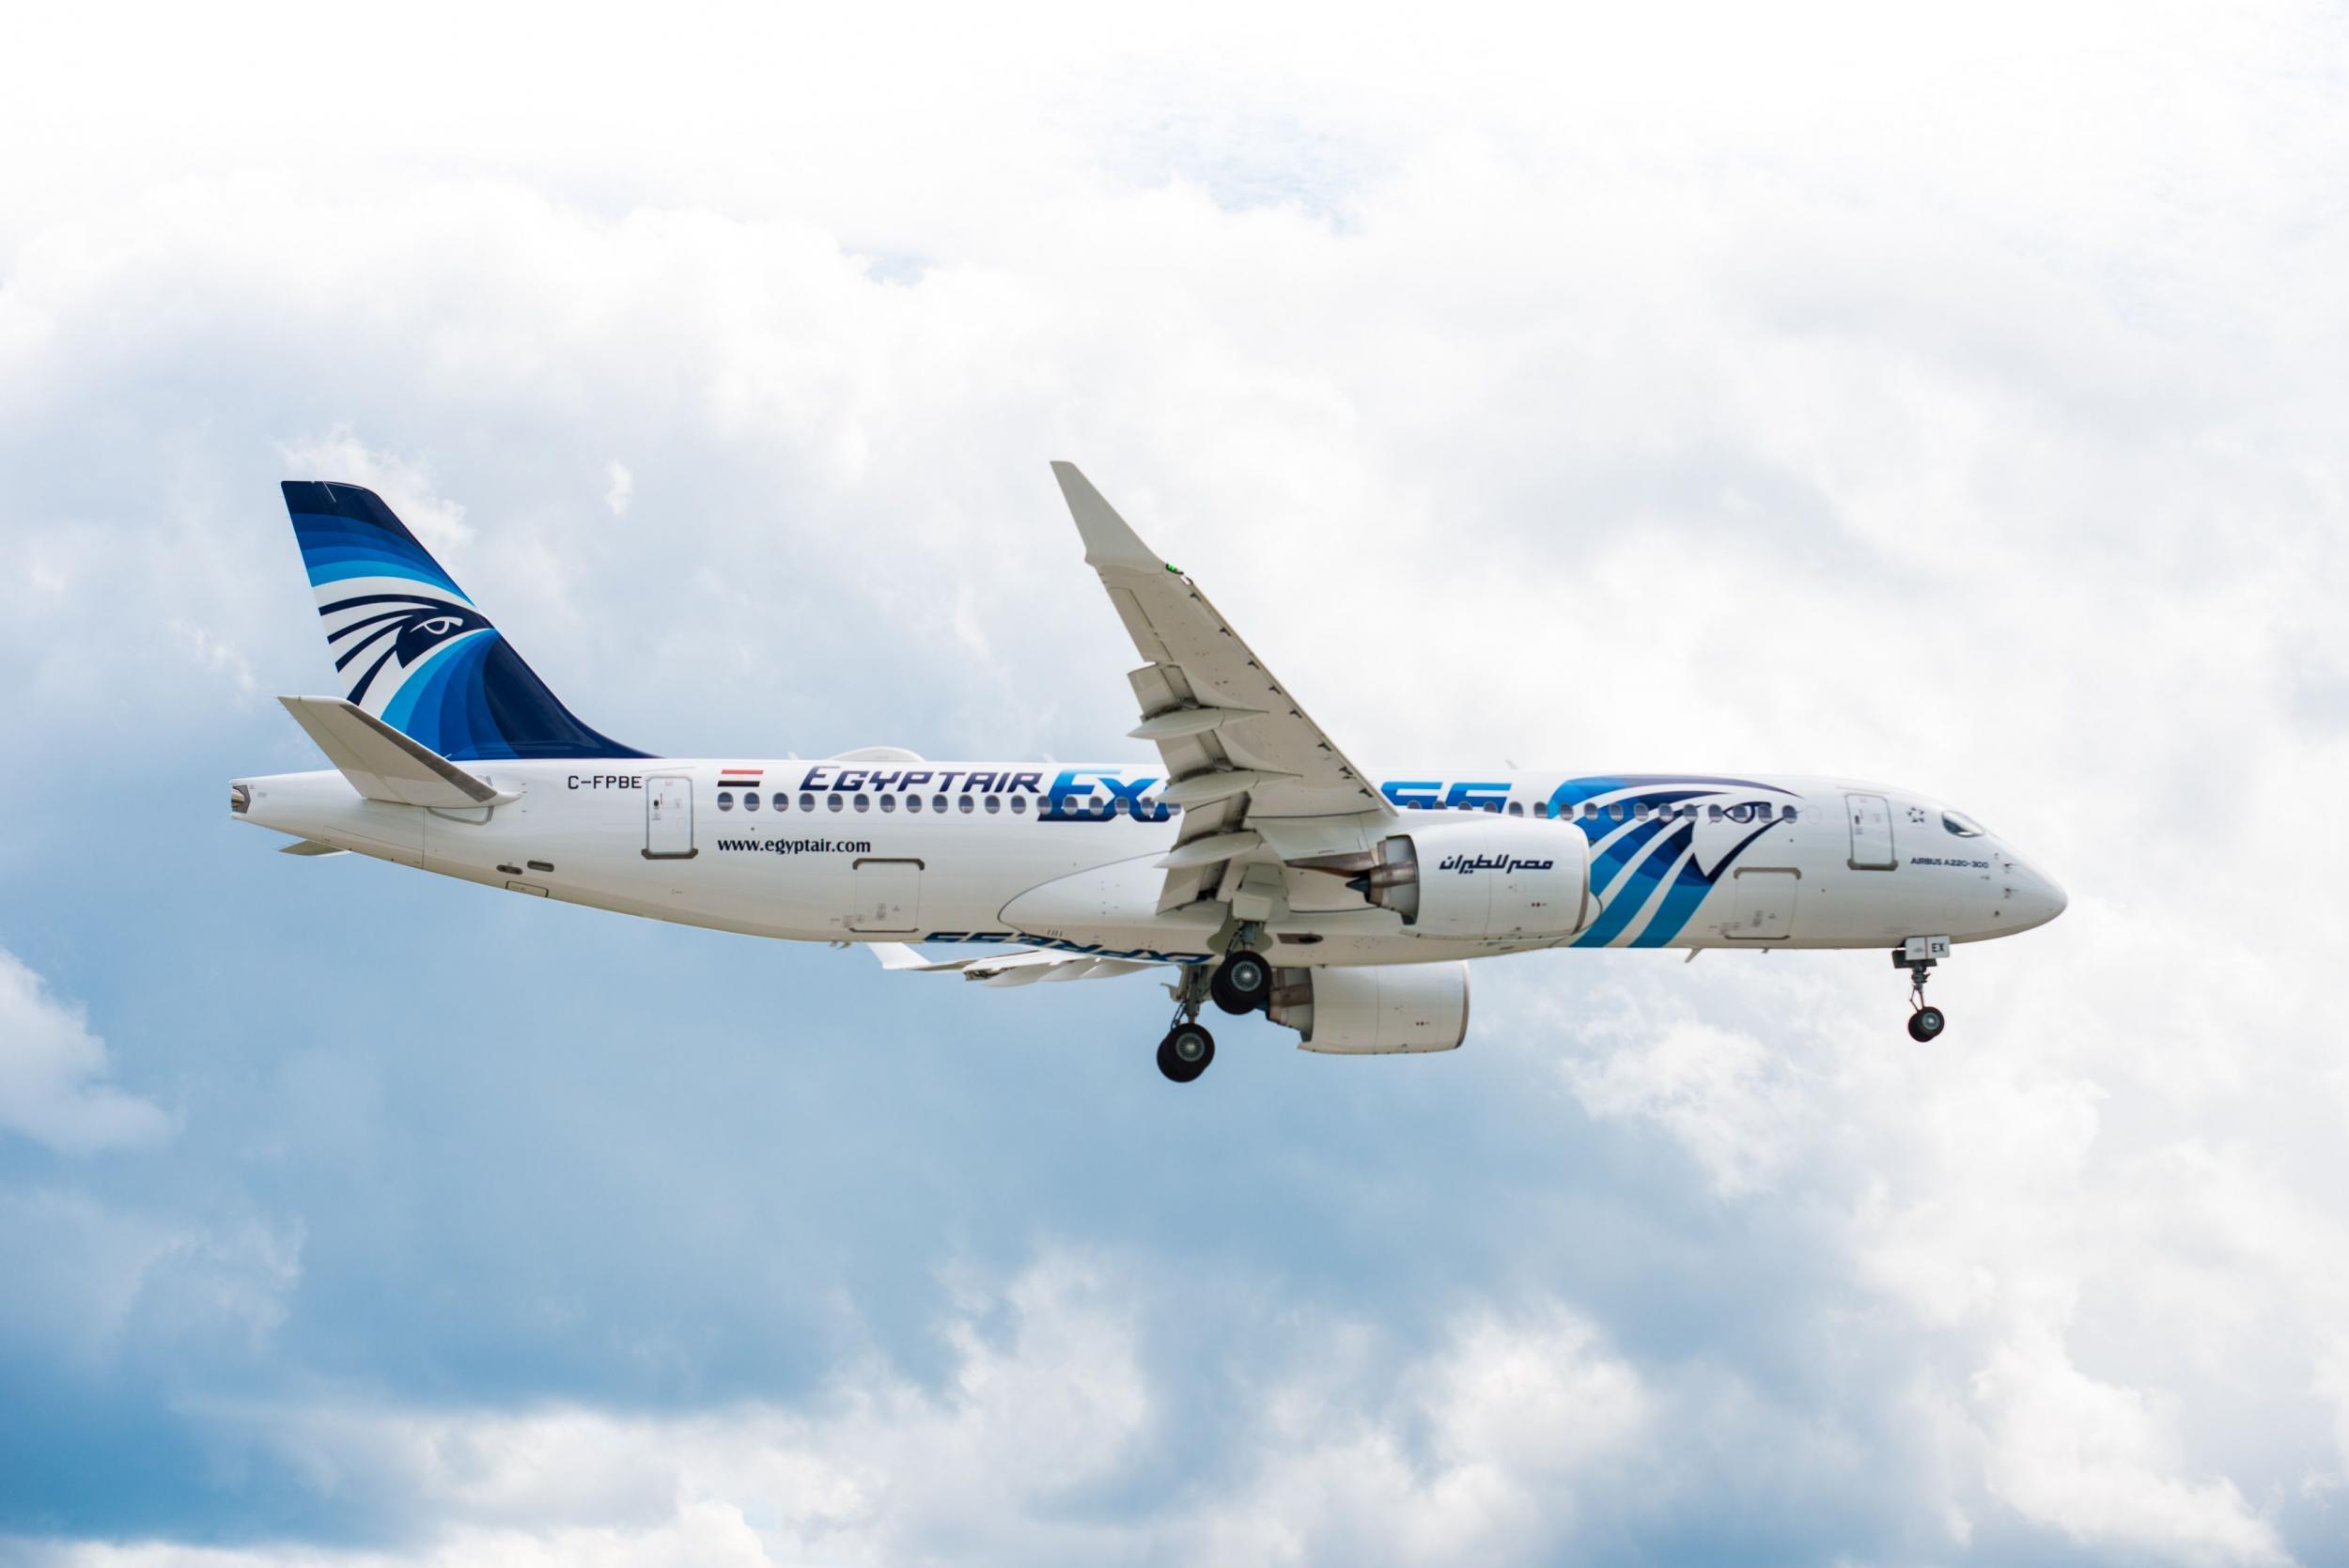 Egyptair Express Airbus A220-300